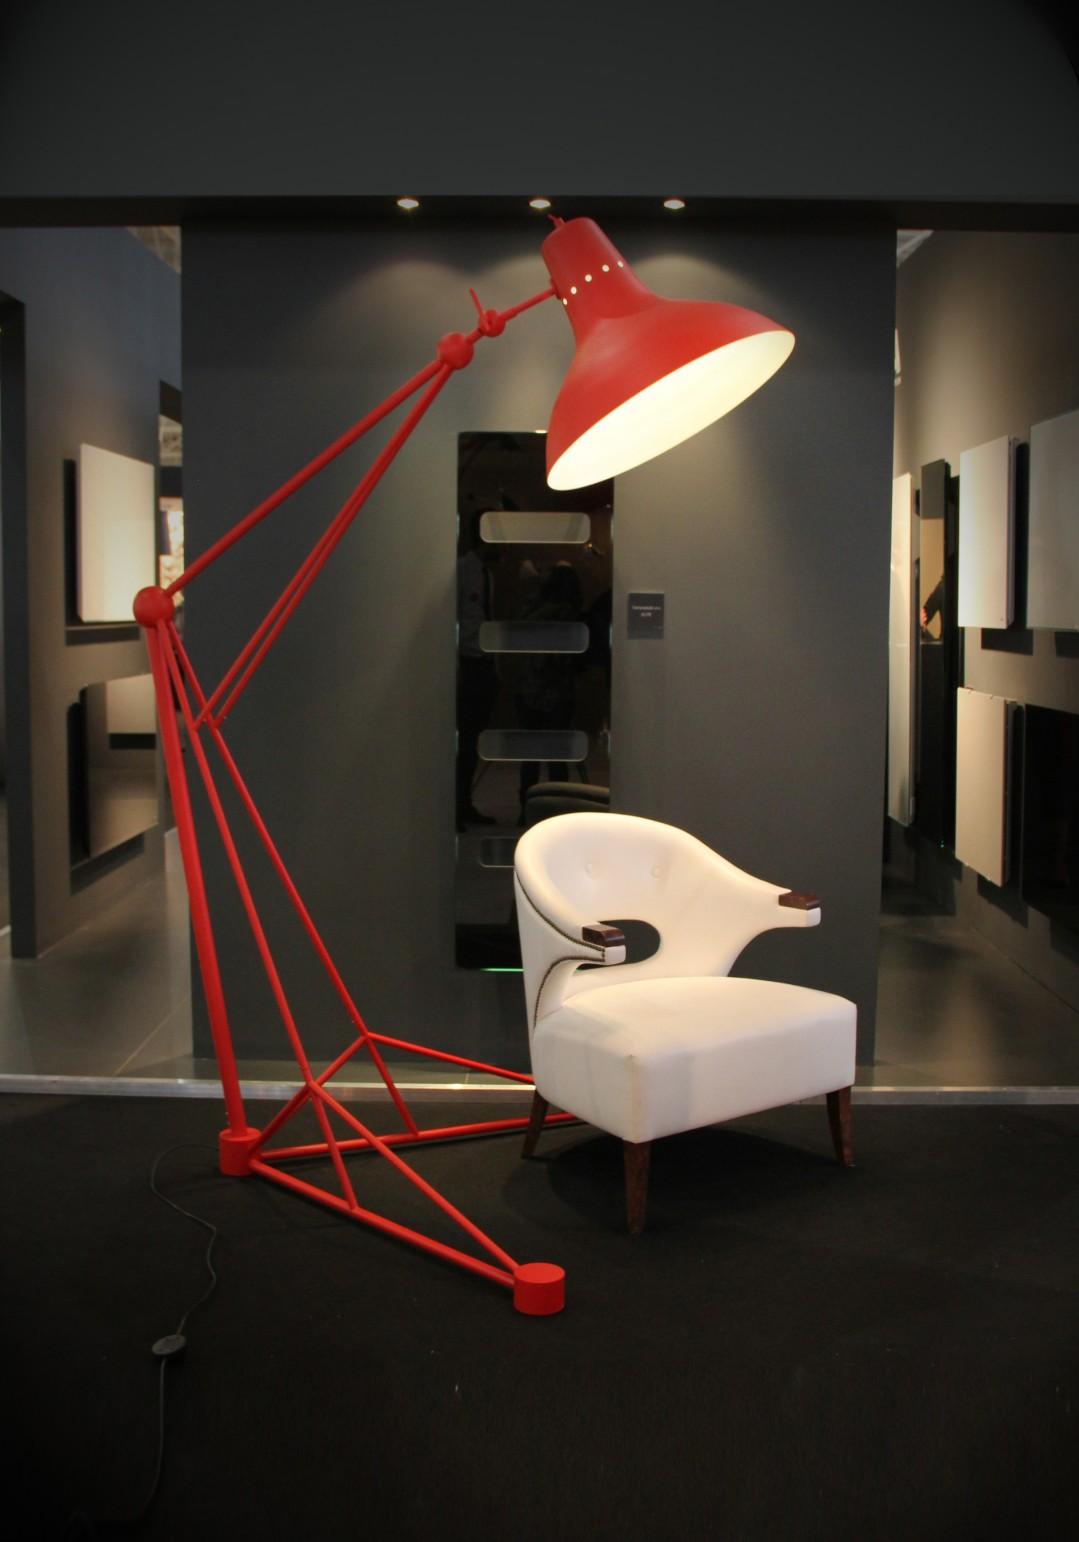 modern floor lamps Modern Floor Lamps In An All Red Everything Decor! Modern Floor Lamps In An All Red Everything Decor 4